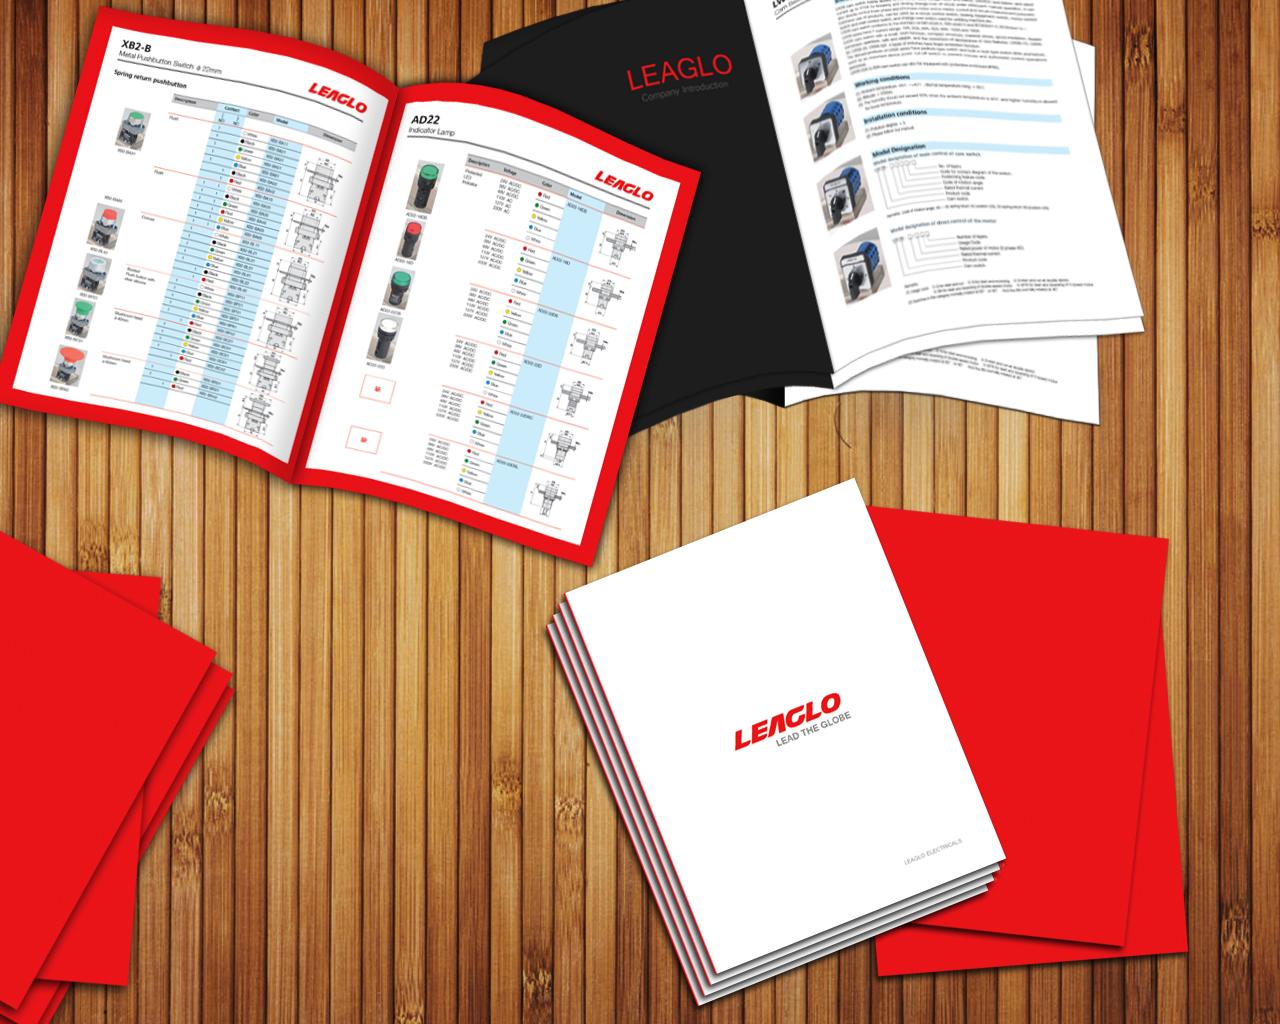 Elegant spielerisch katalog design for a company by sisu for Design katalog